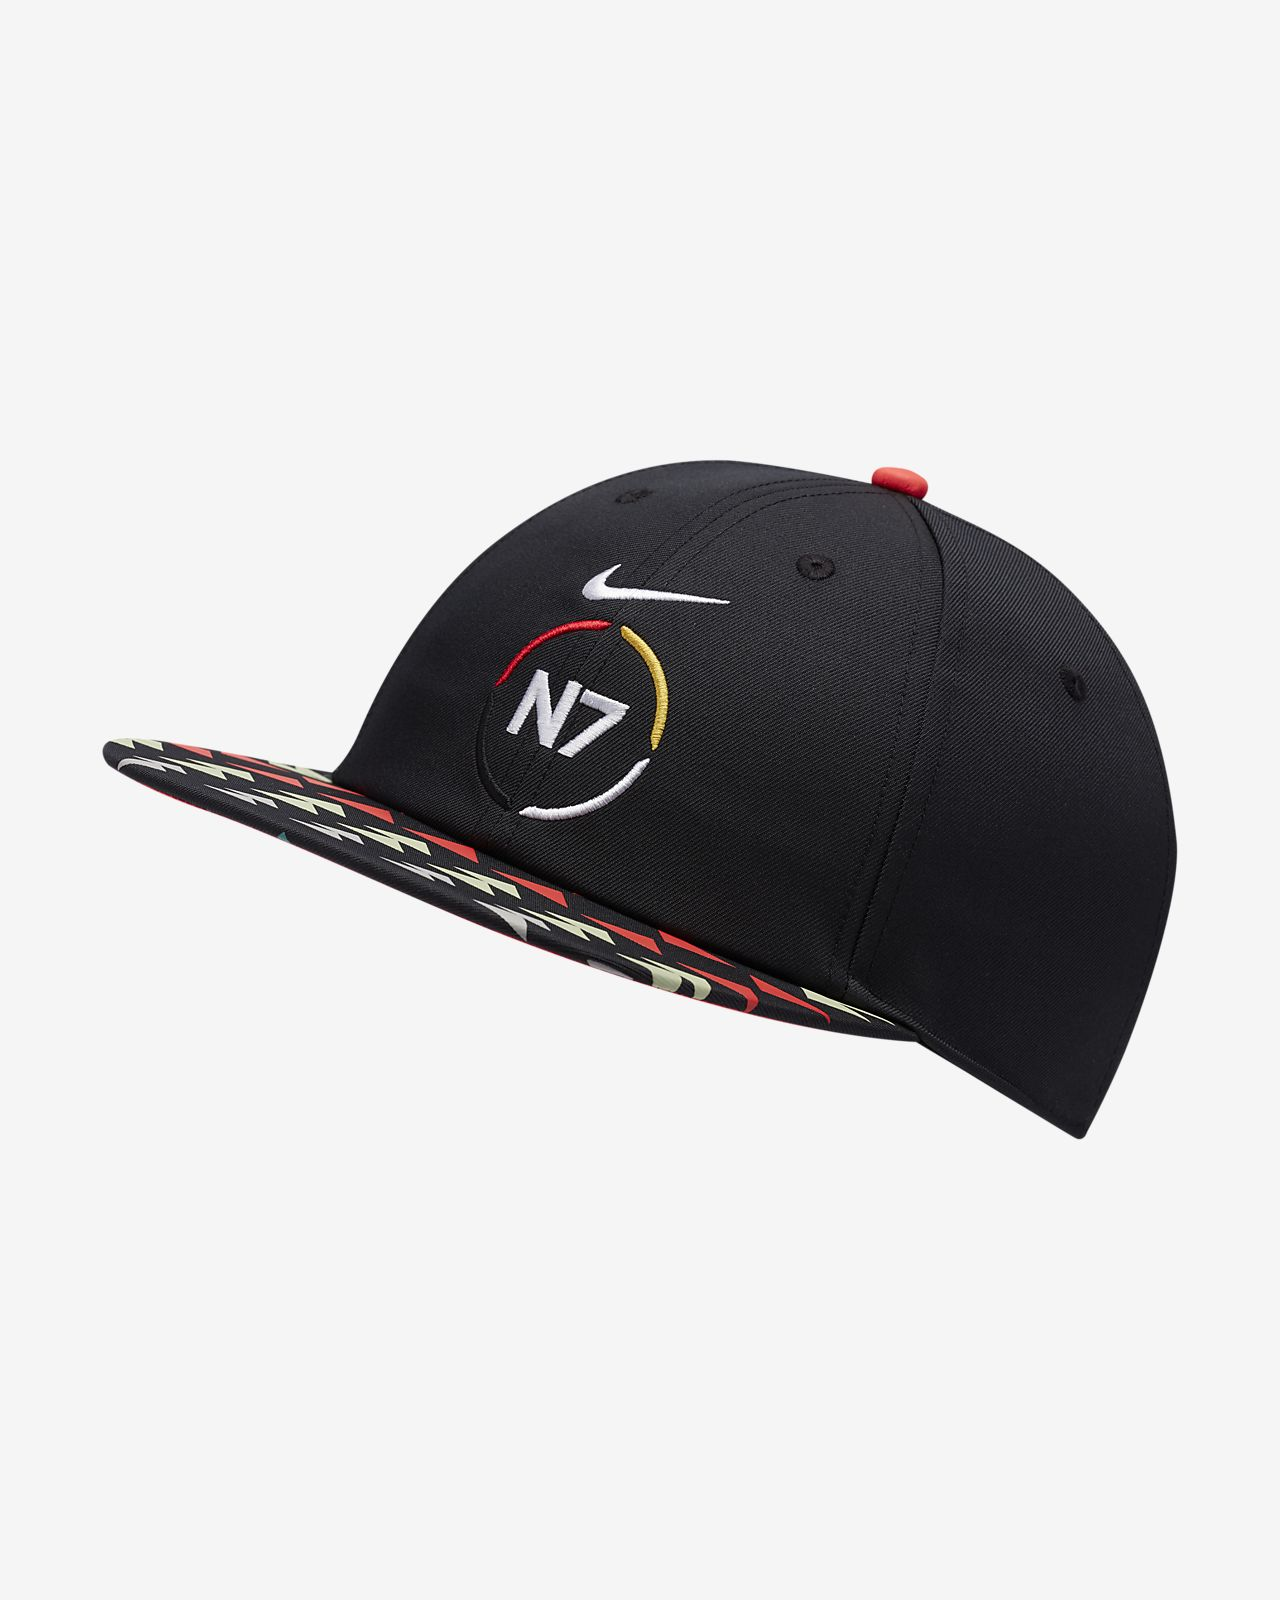 Gorra con visera plana Nike Sportswear N7